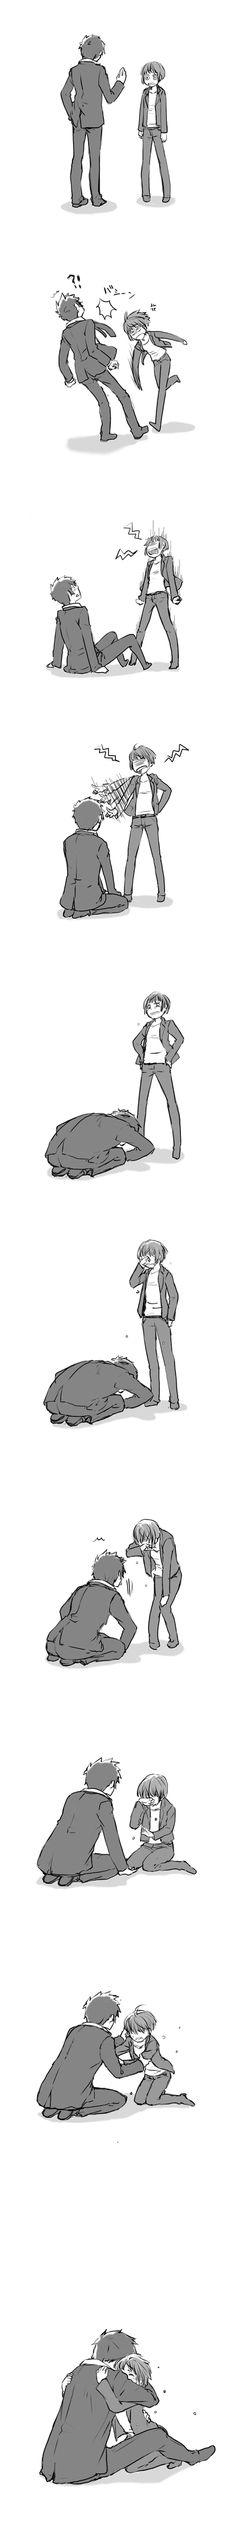 """Kougami Shinya"" ""Tsunemori Akane"" it's odd how much this is like my boyfriend and I"